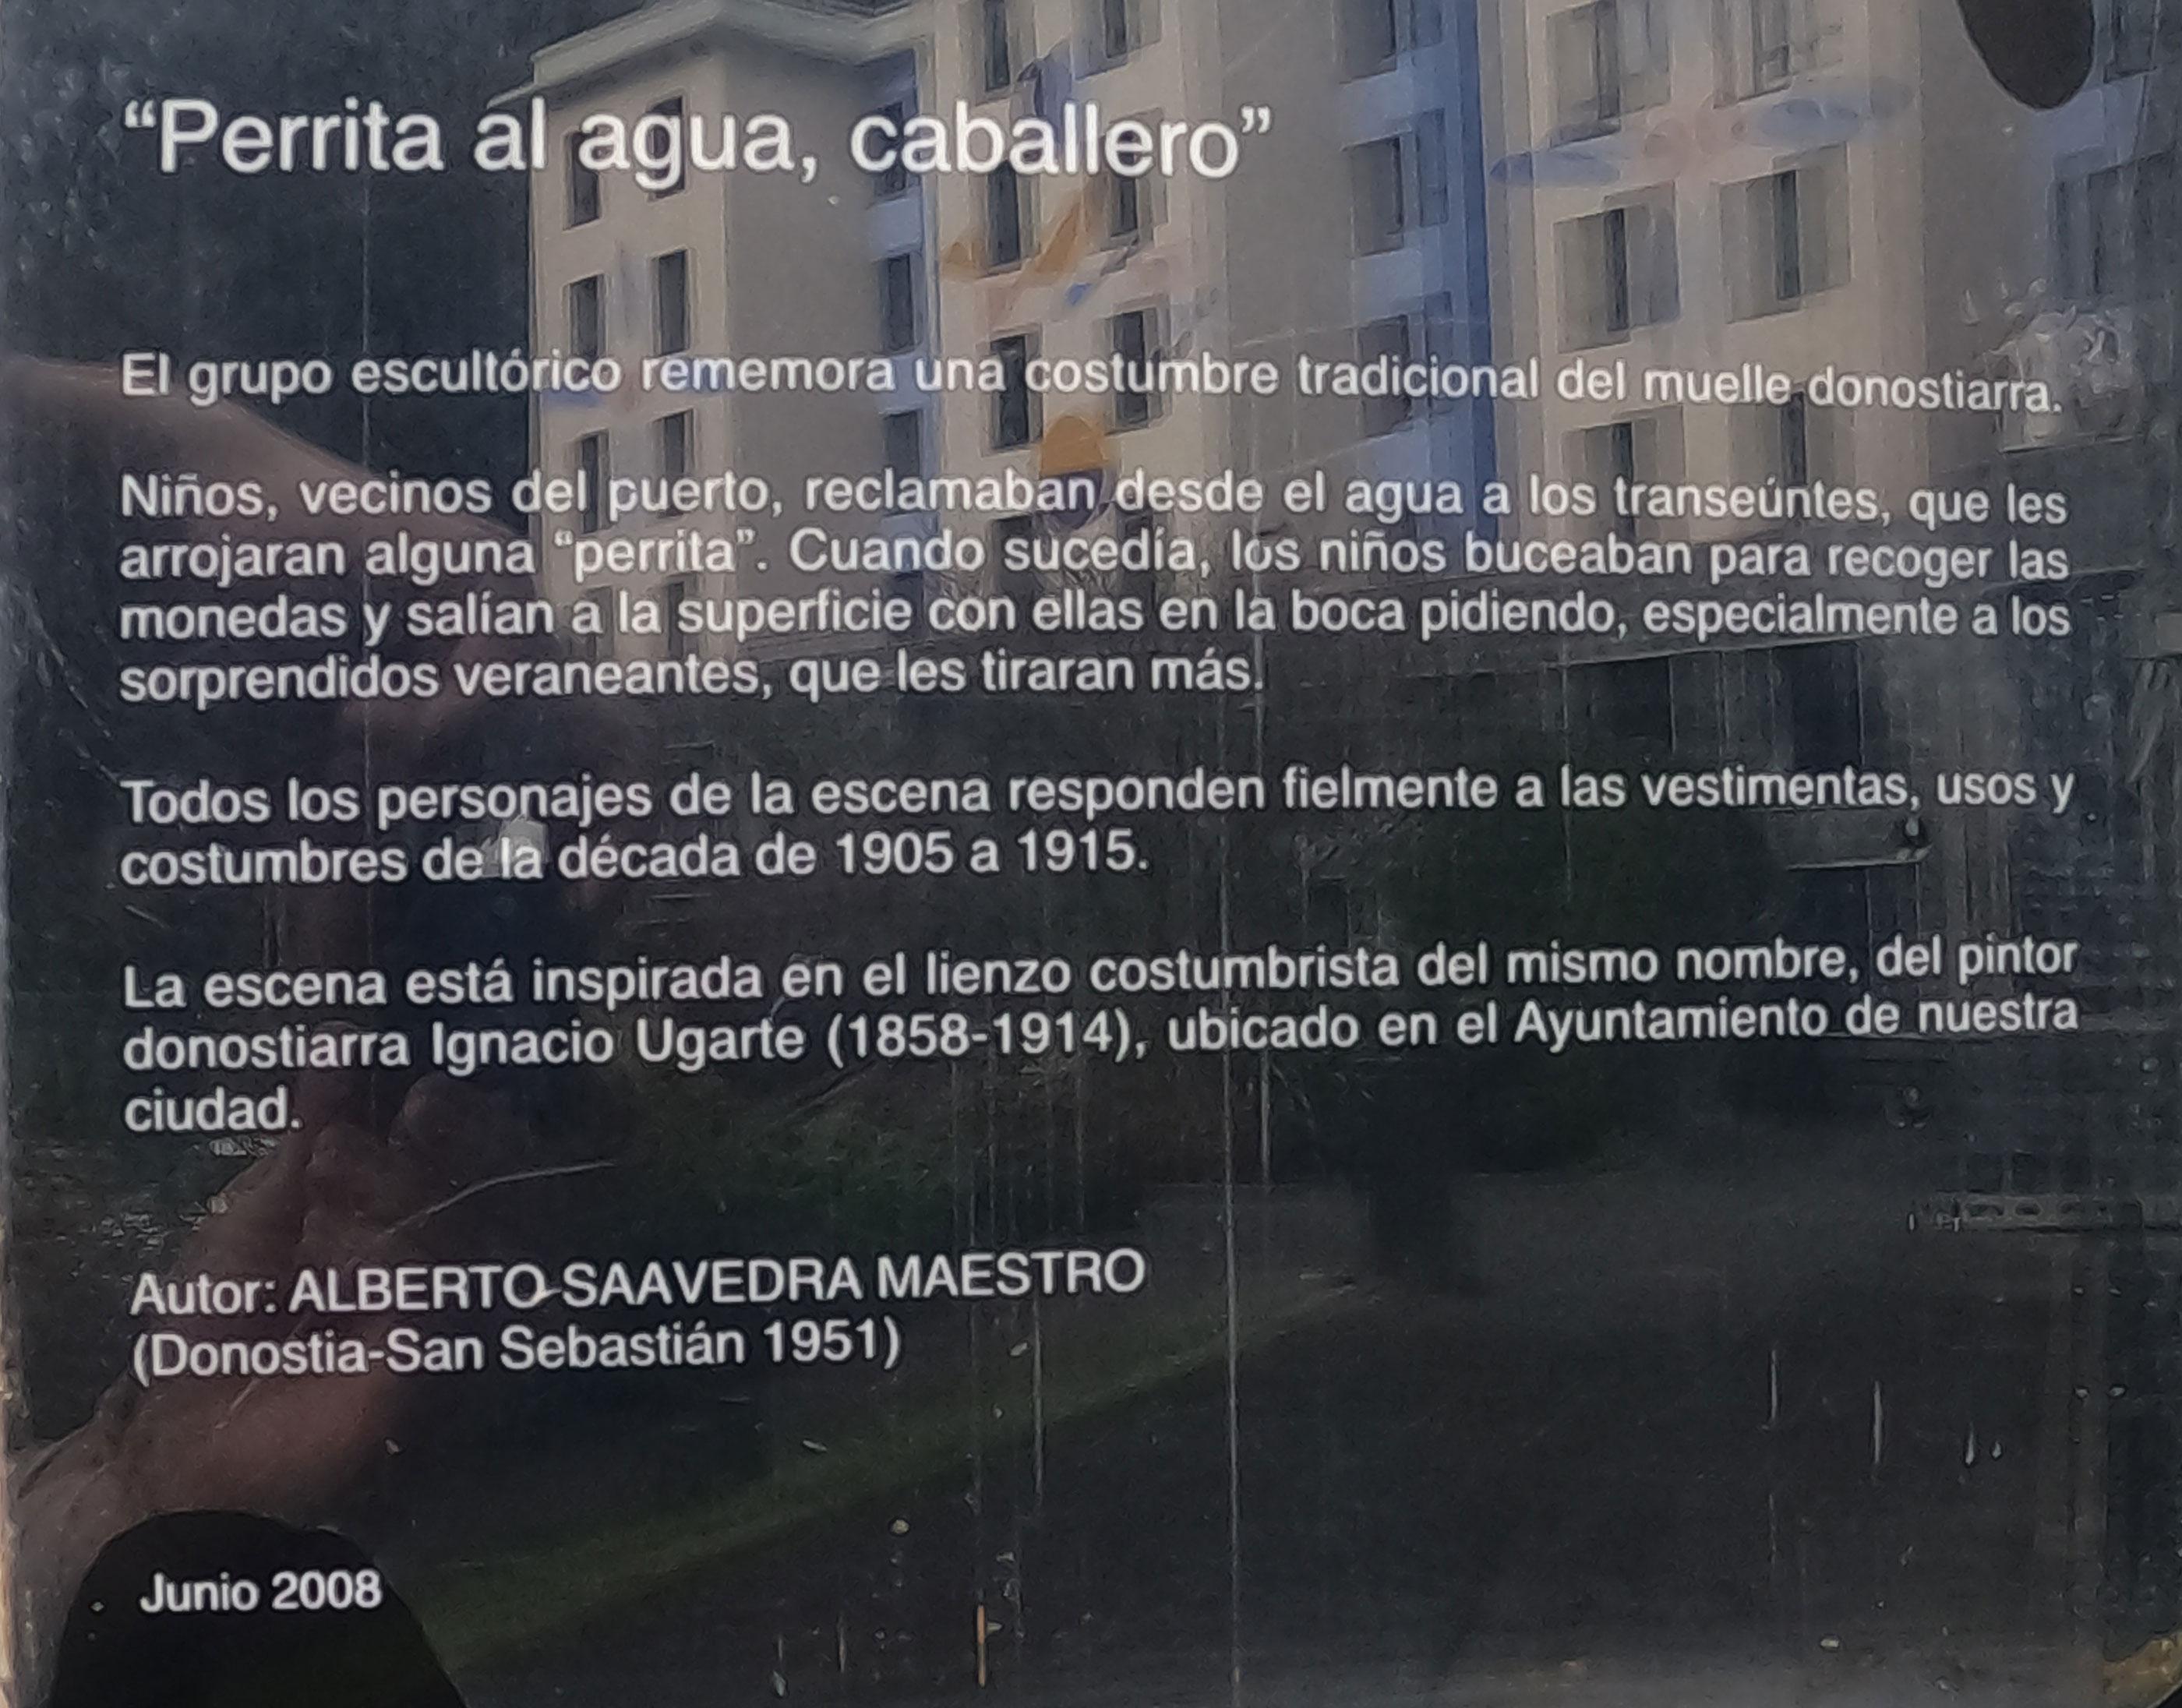 Escultura de Alberto Saavedra Maestro